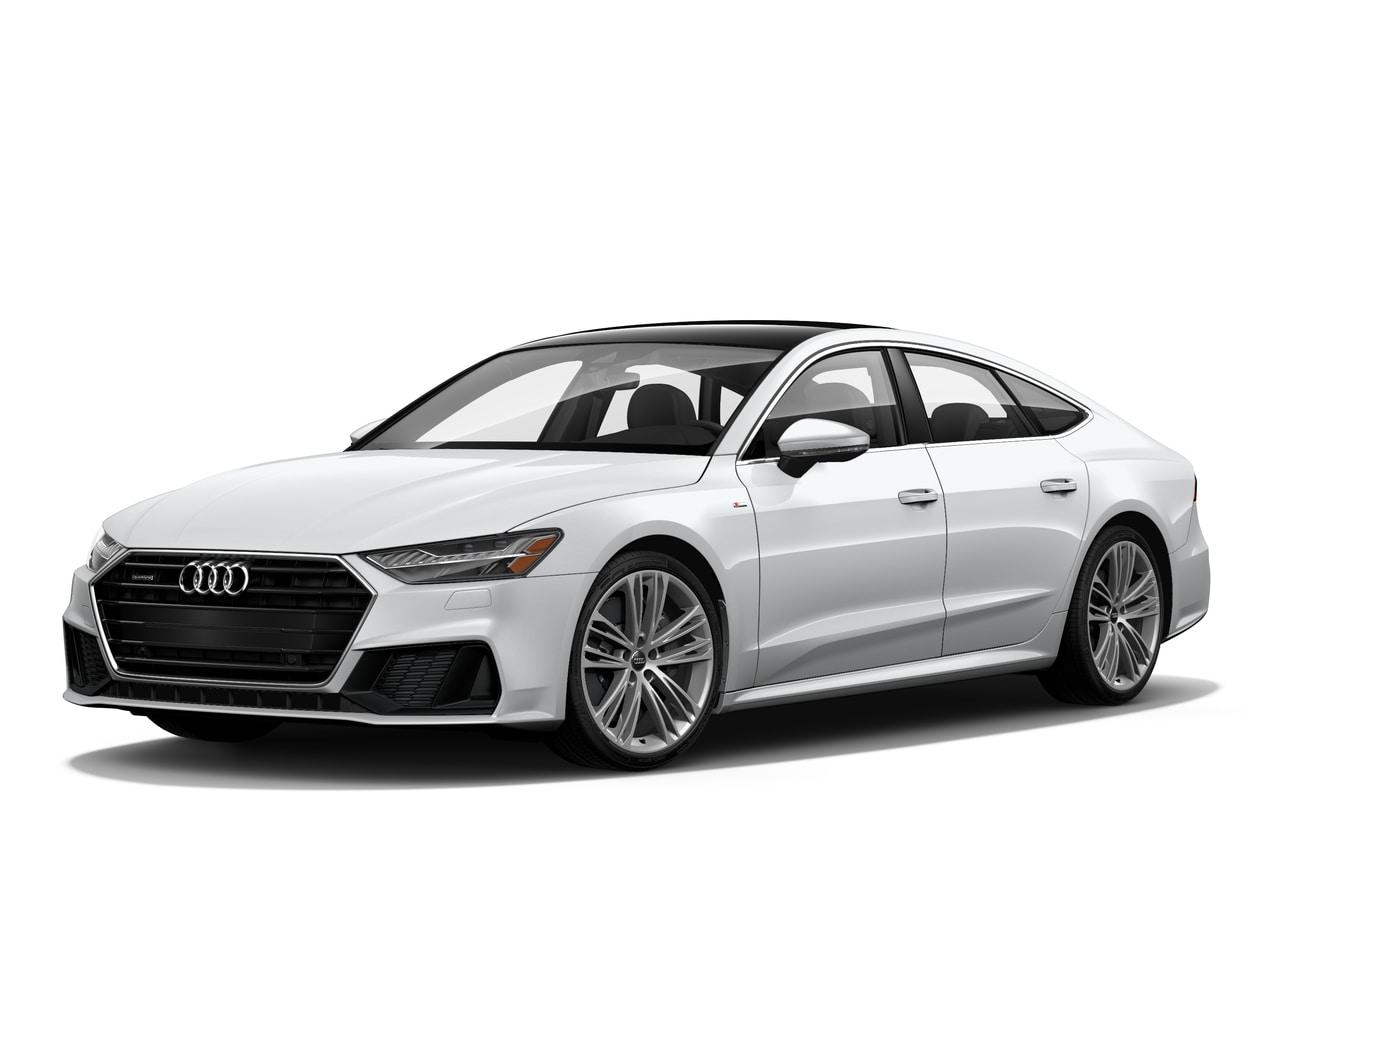 2019 Audi A7 Hatchback